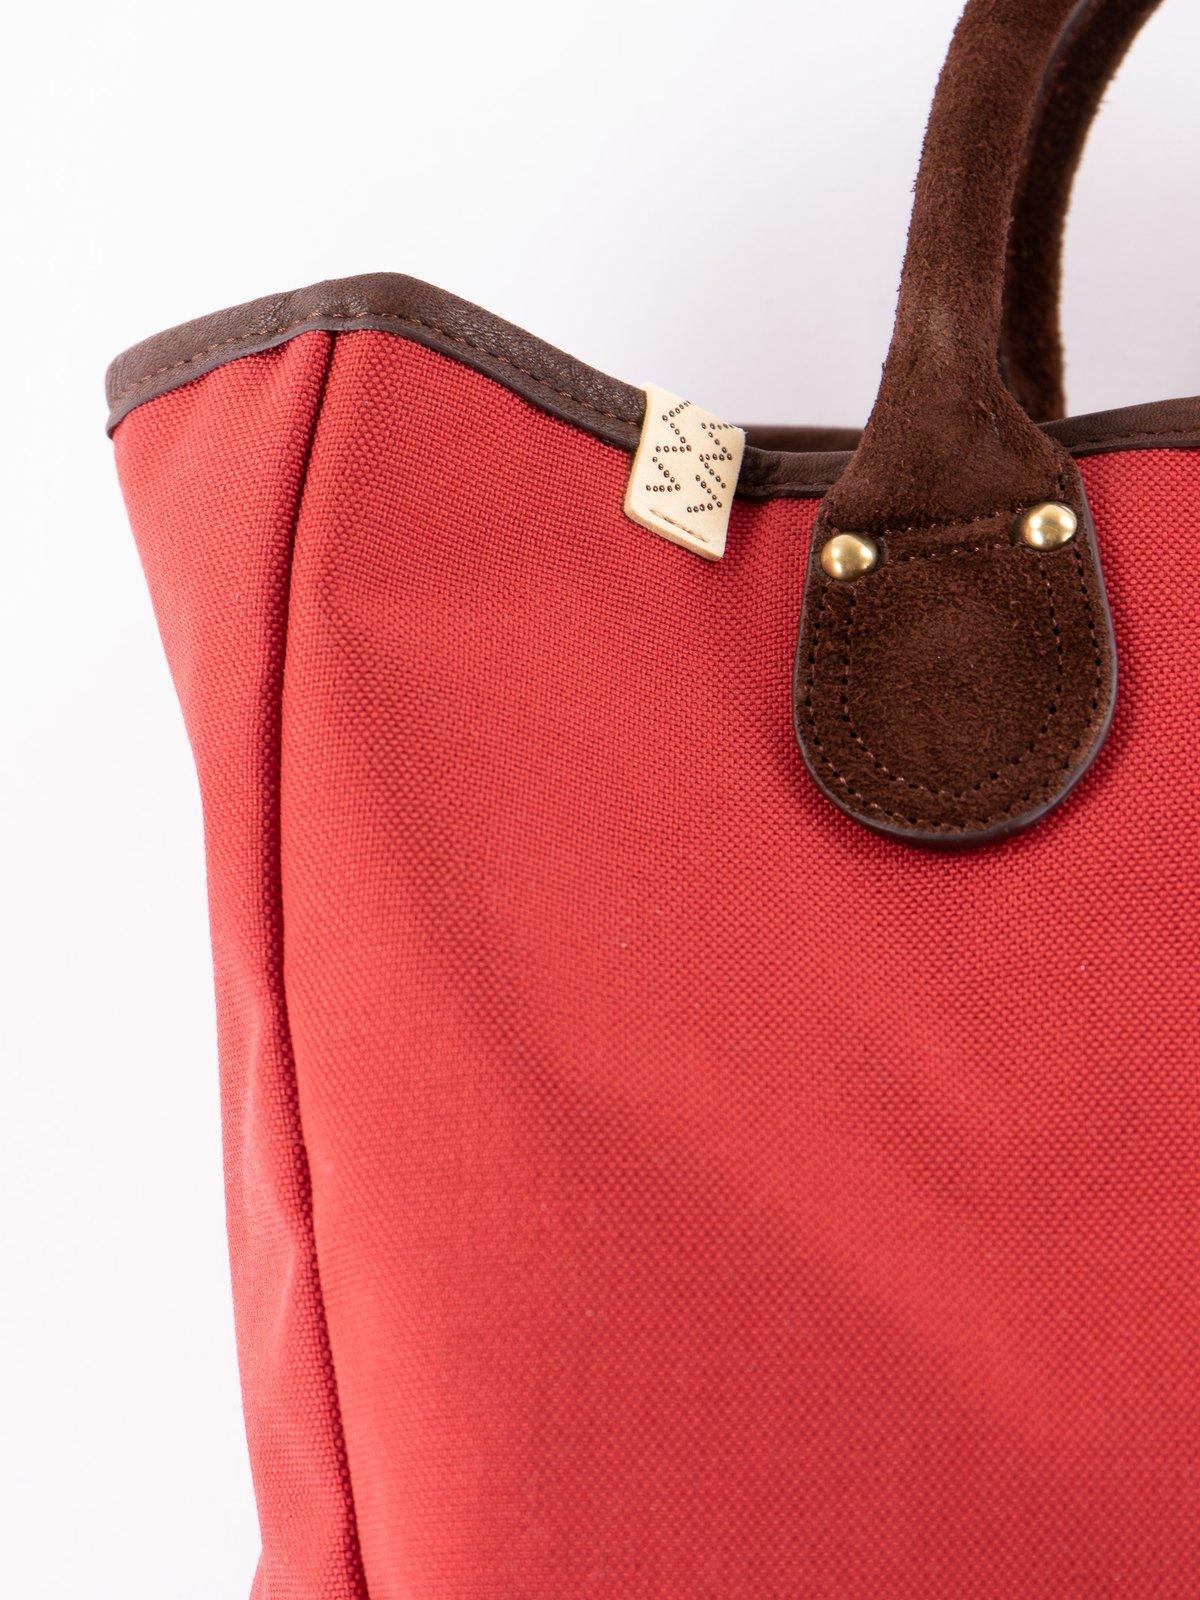 Red Cordura Daytripper Tote - Image 2